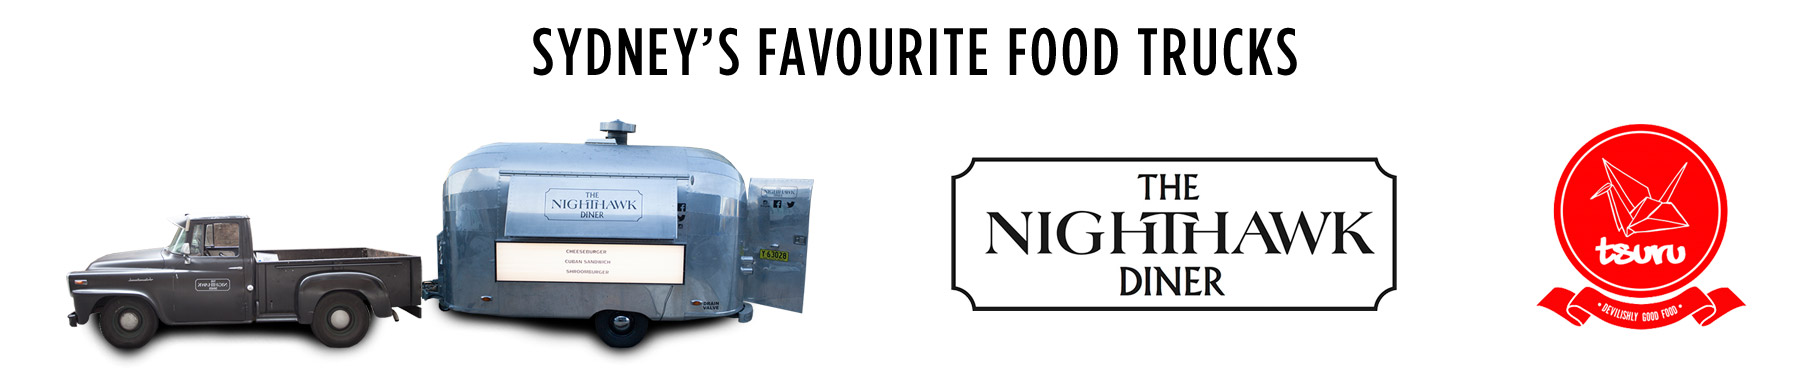 sydney-best-food-trucks